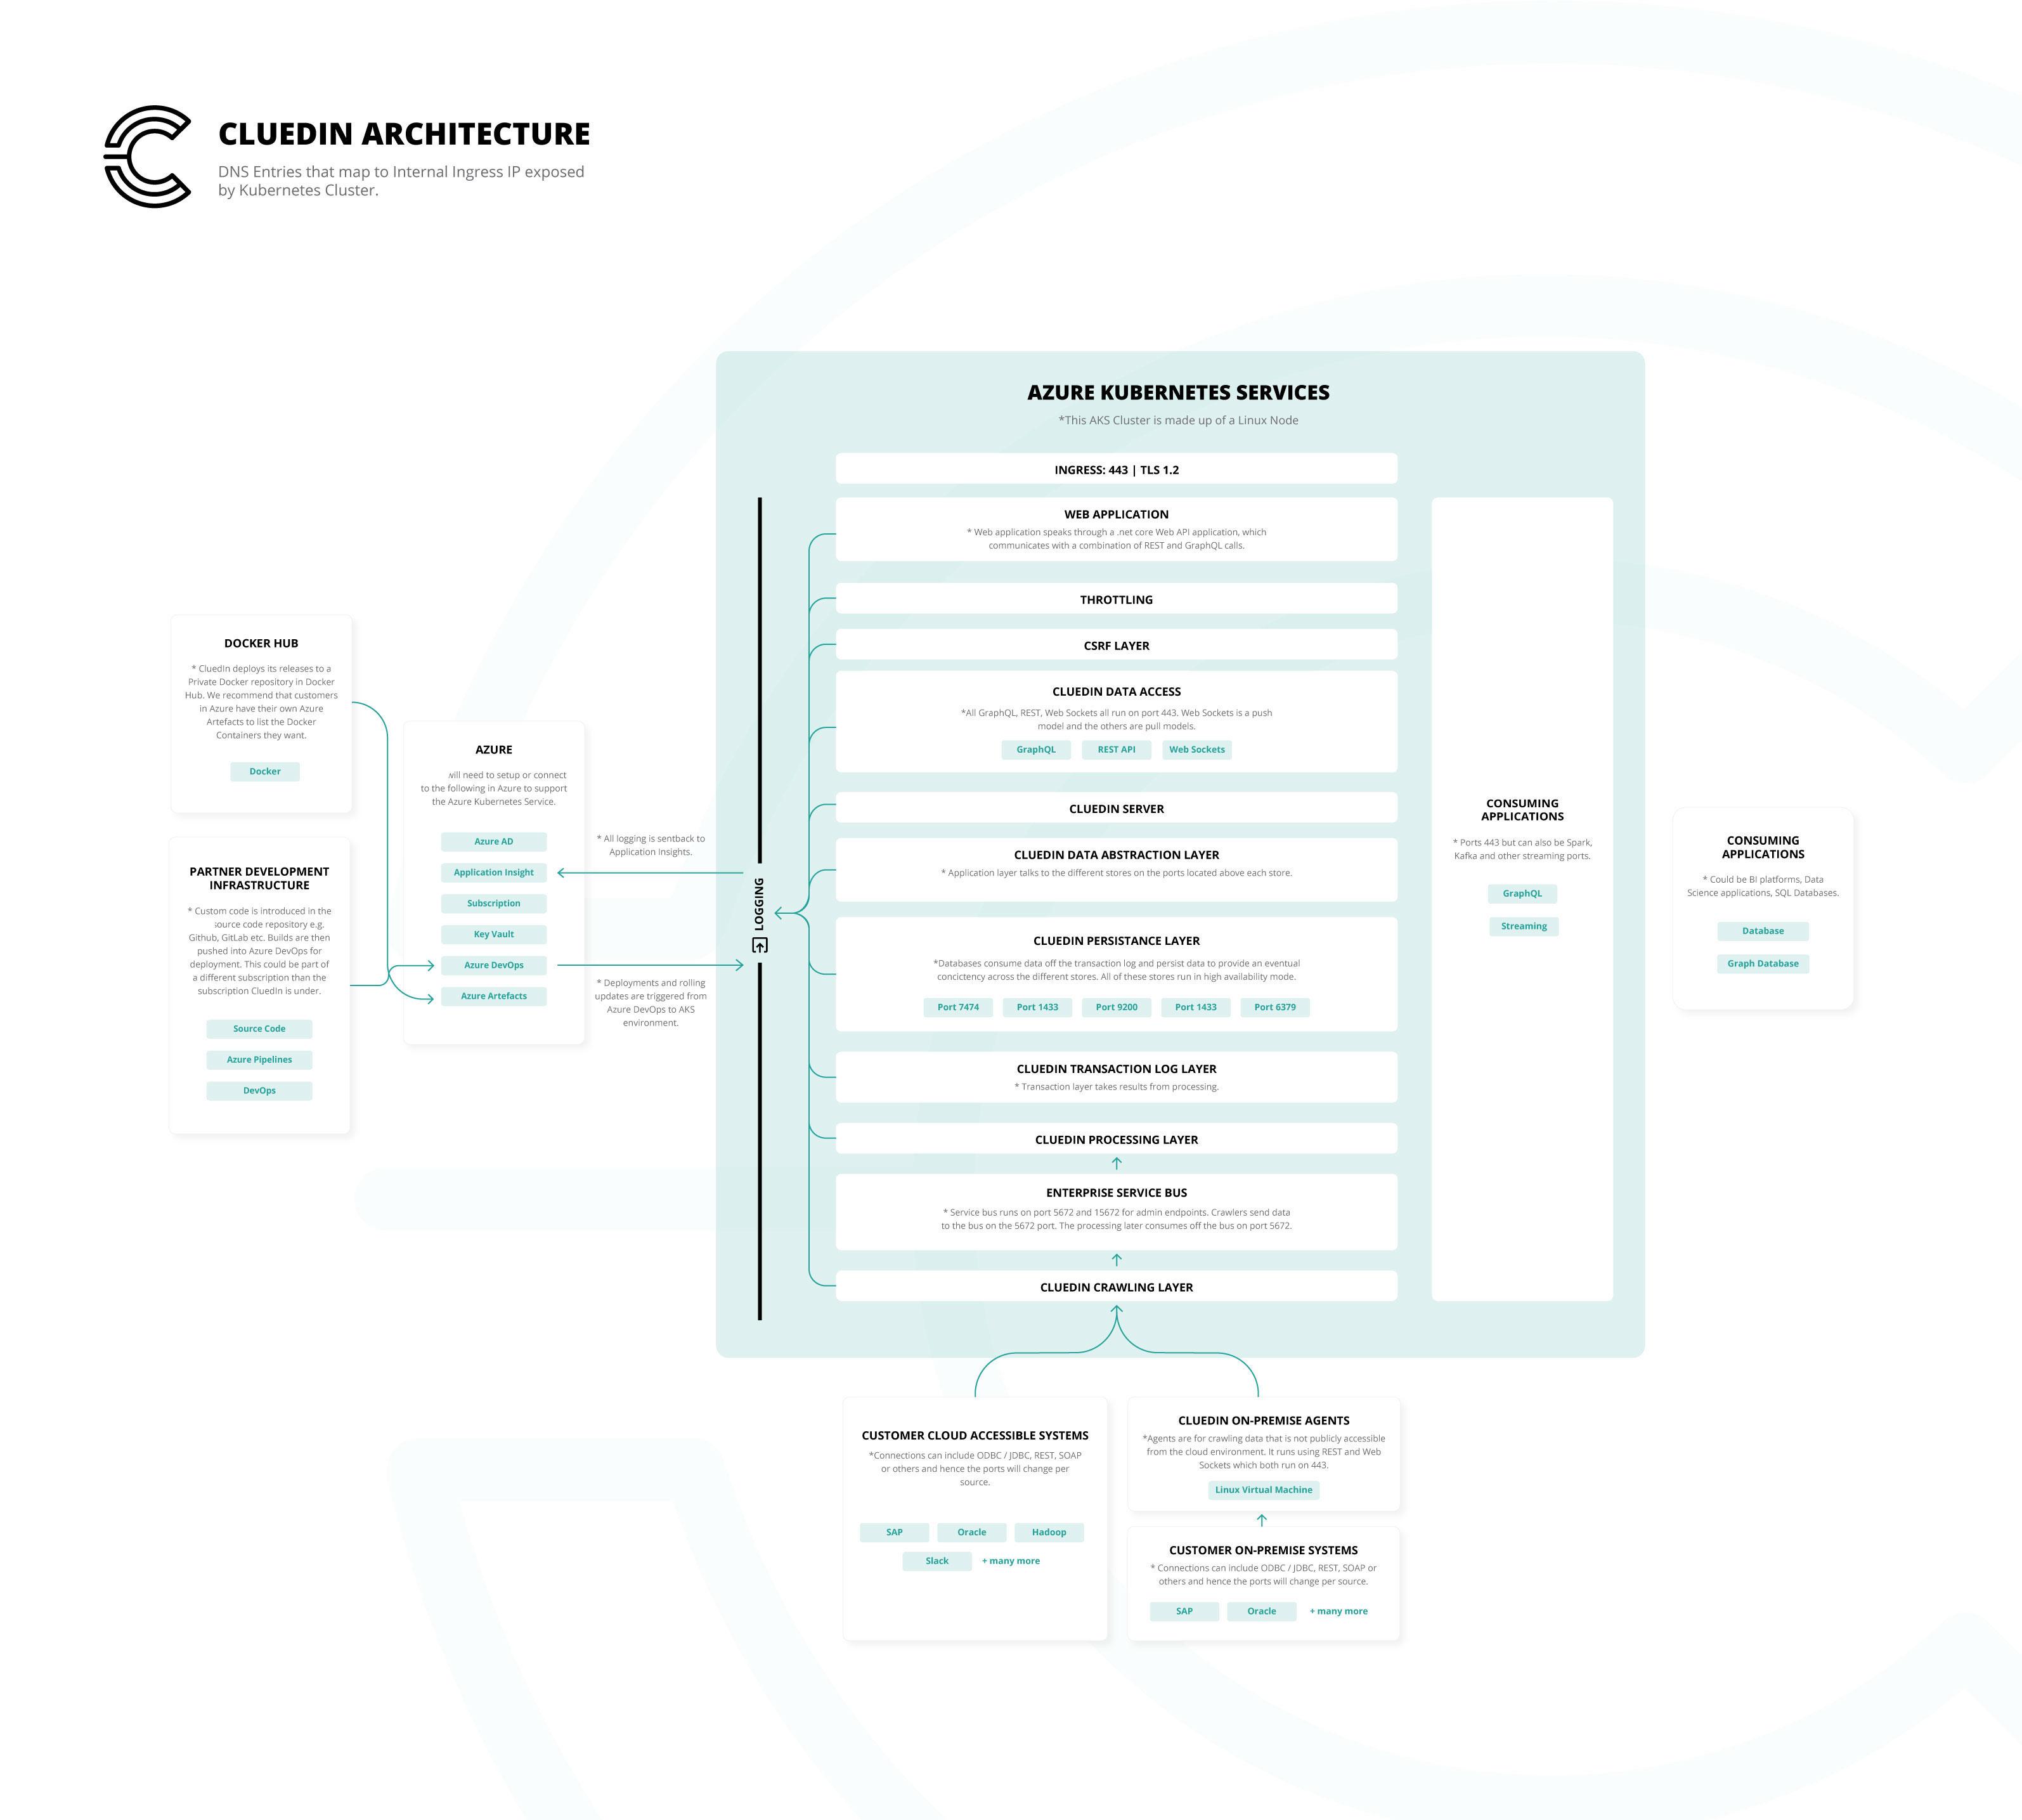 CluedIn-Architecture